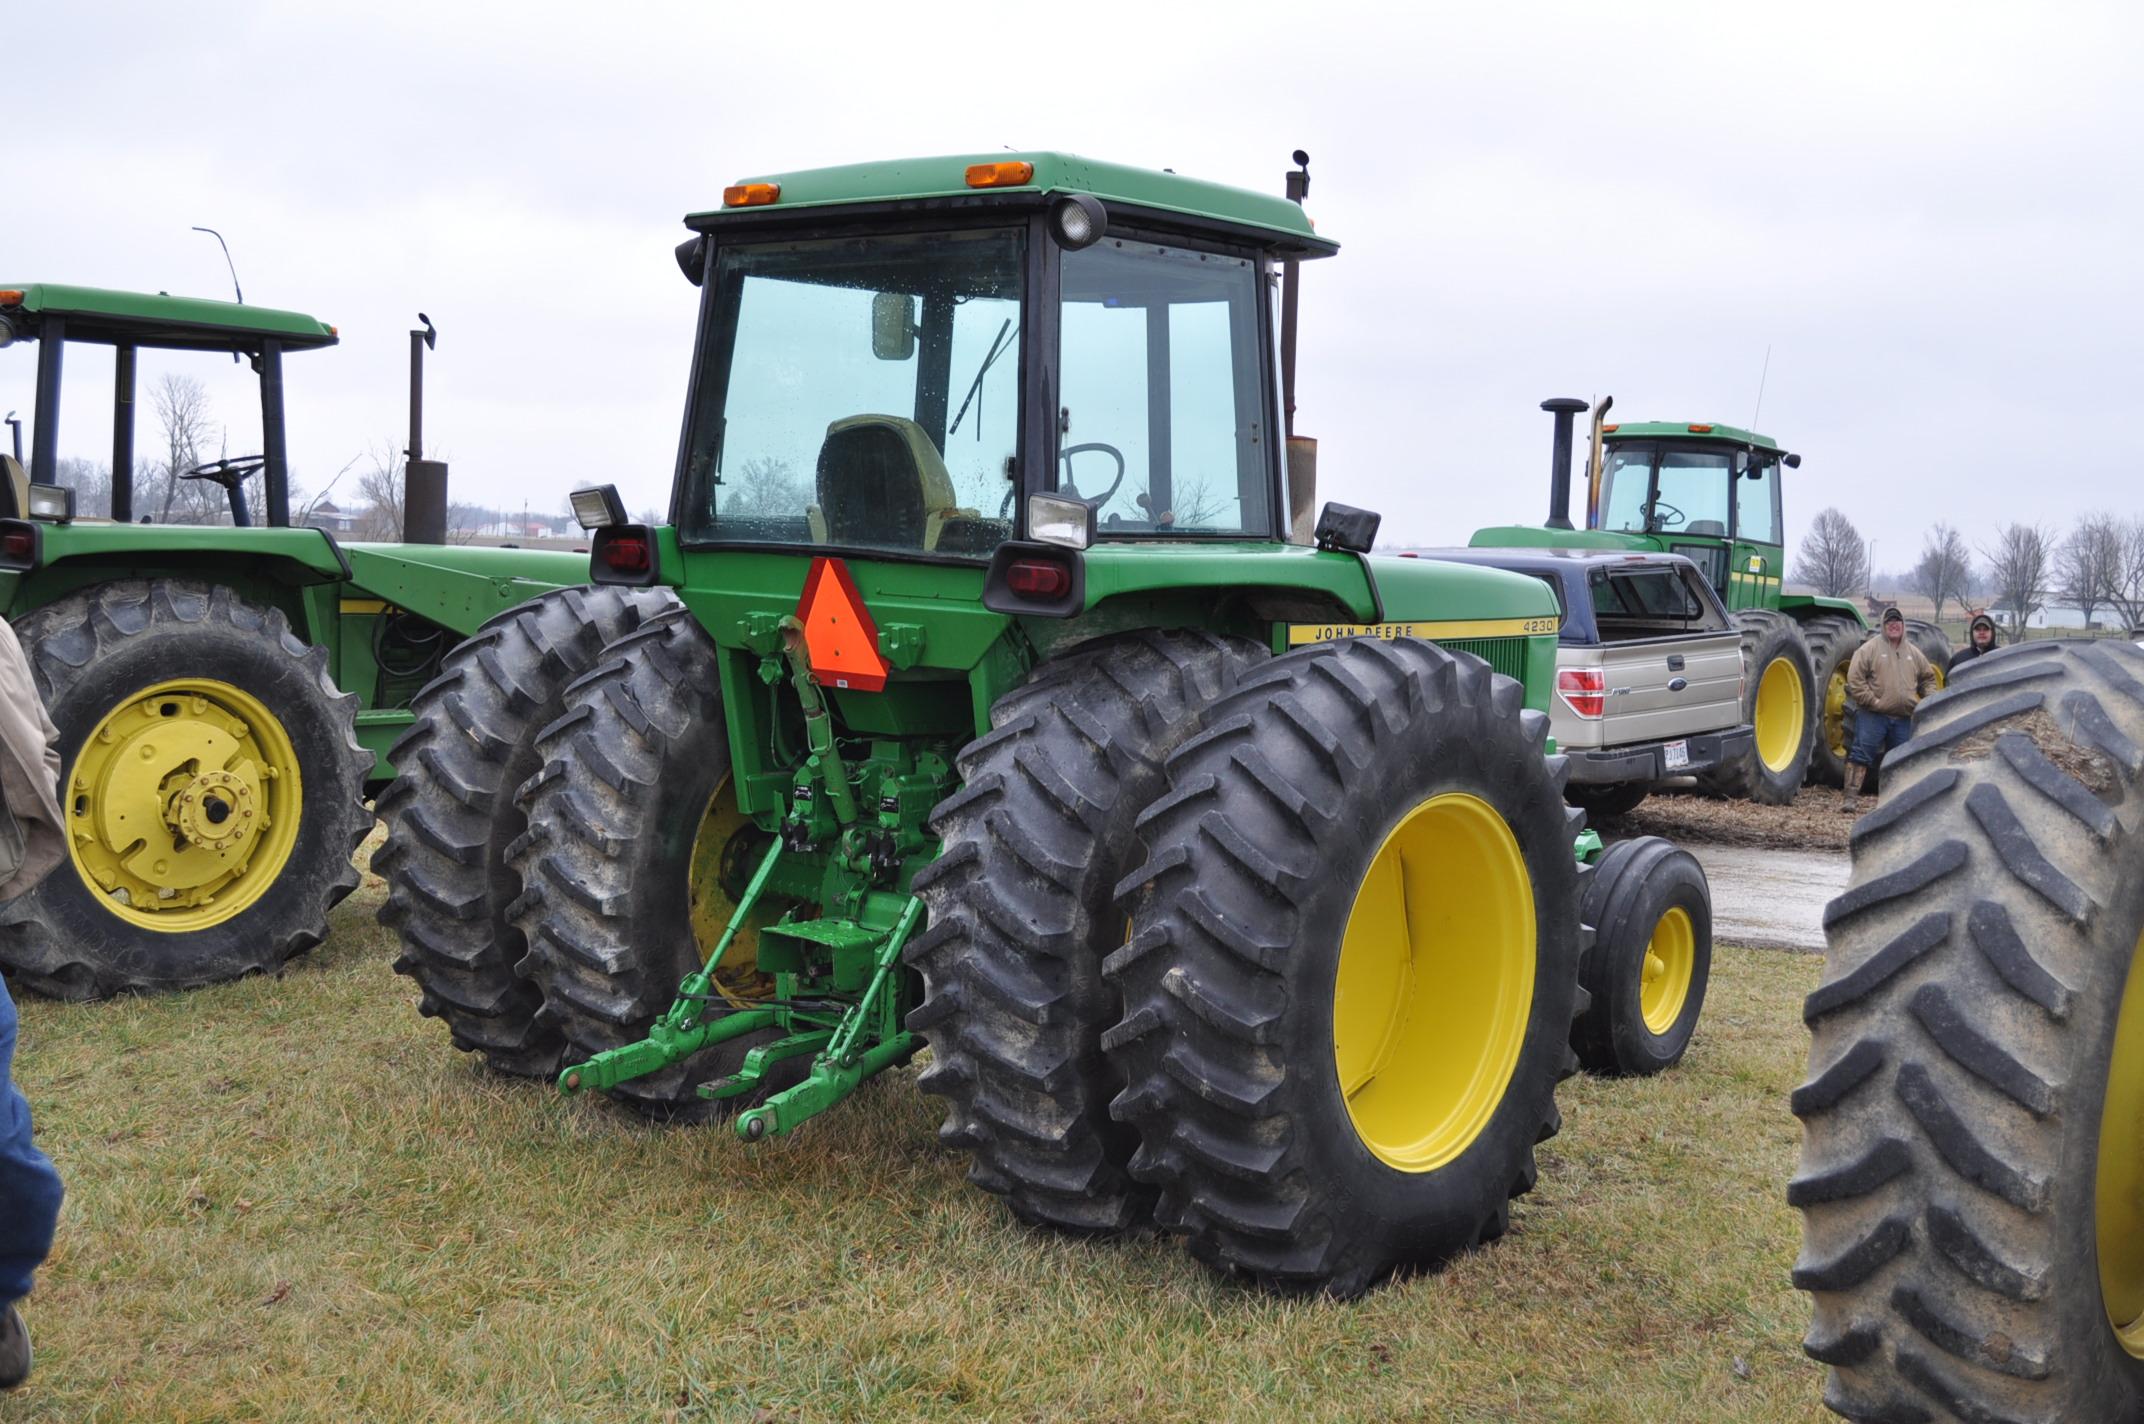 John Deere 4230 tractor, diesel, 18.4-34 hub duals, 10.00-16 front, CHA, Quad range, 2 hyd - Image 3 of 23